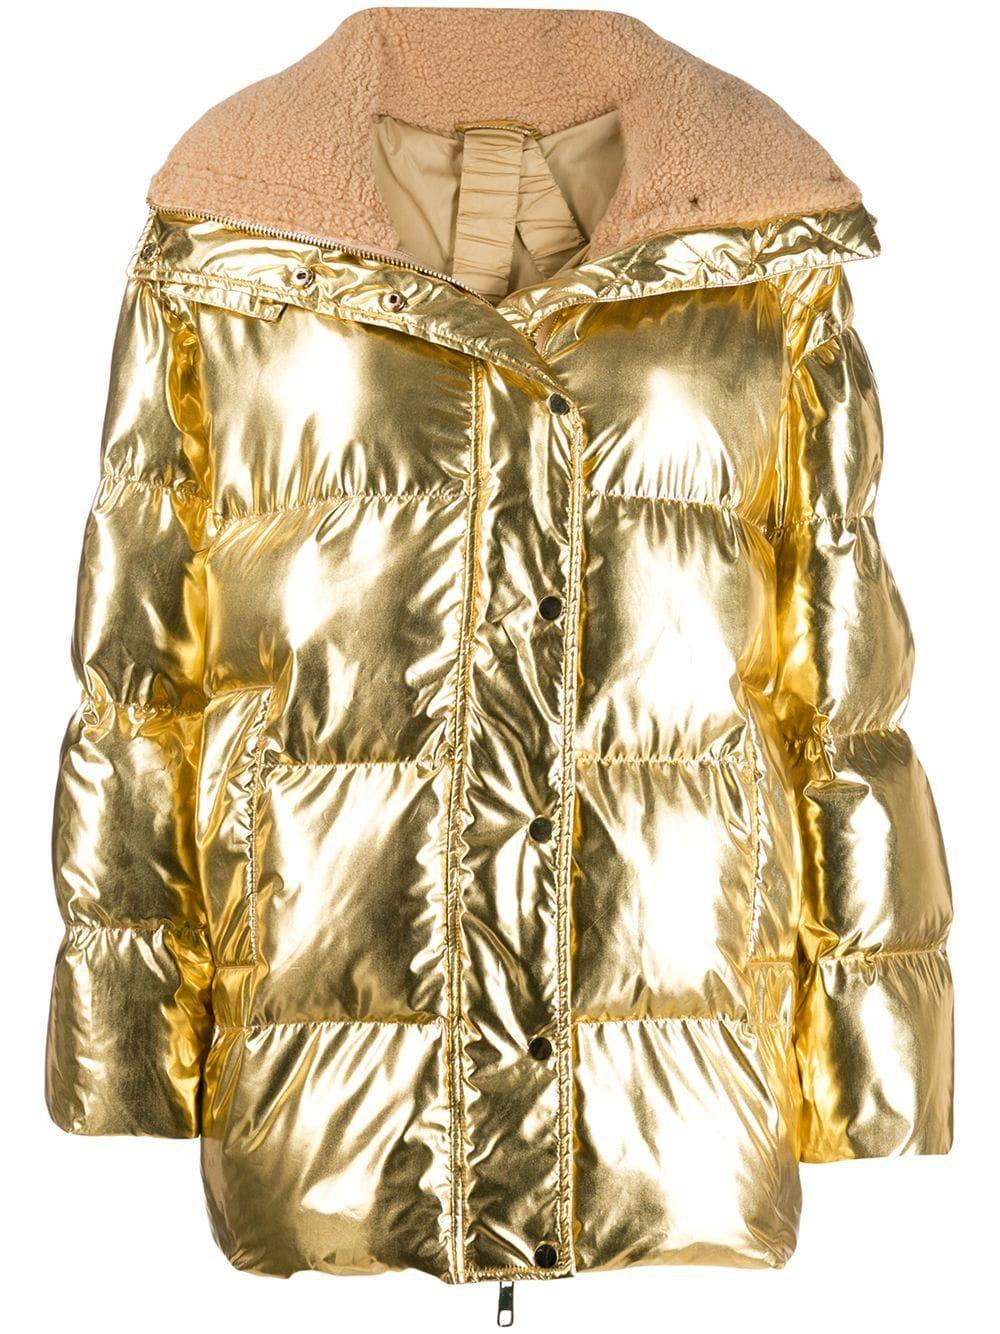 P A R O S H Metallic Puffer Jacket Farfetch Puffer Jackets Jackets P A R O S H [ 1334 x 1000 Pixel ]